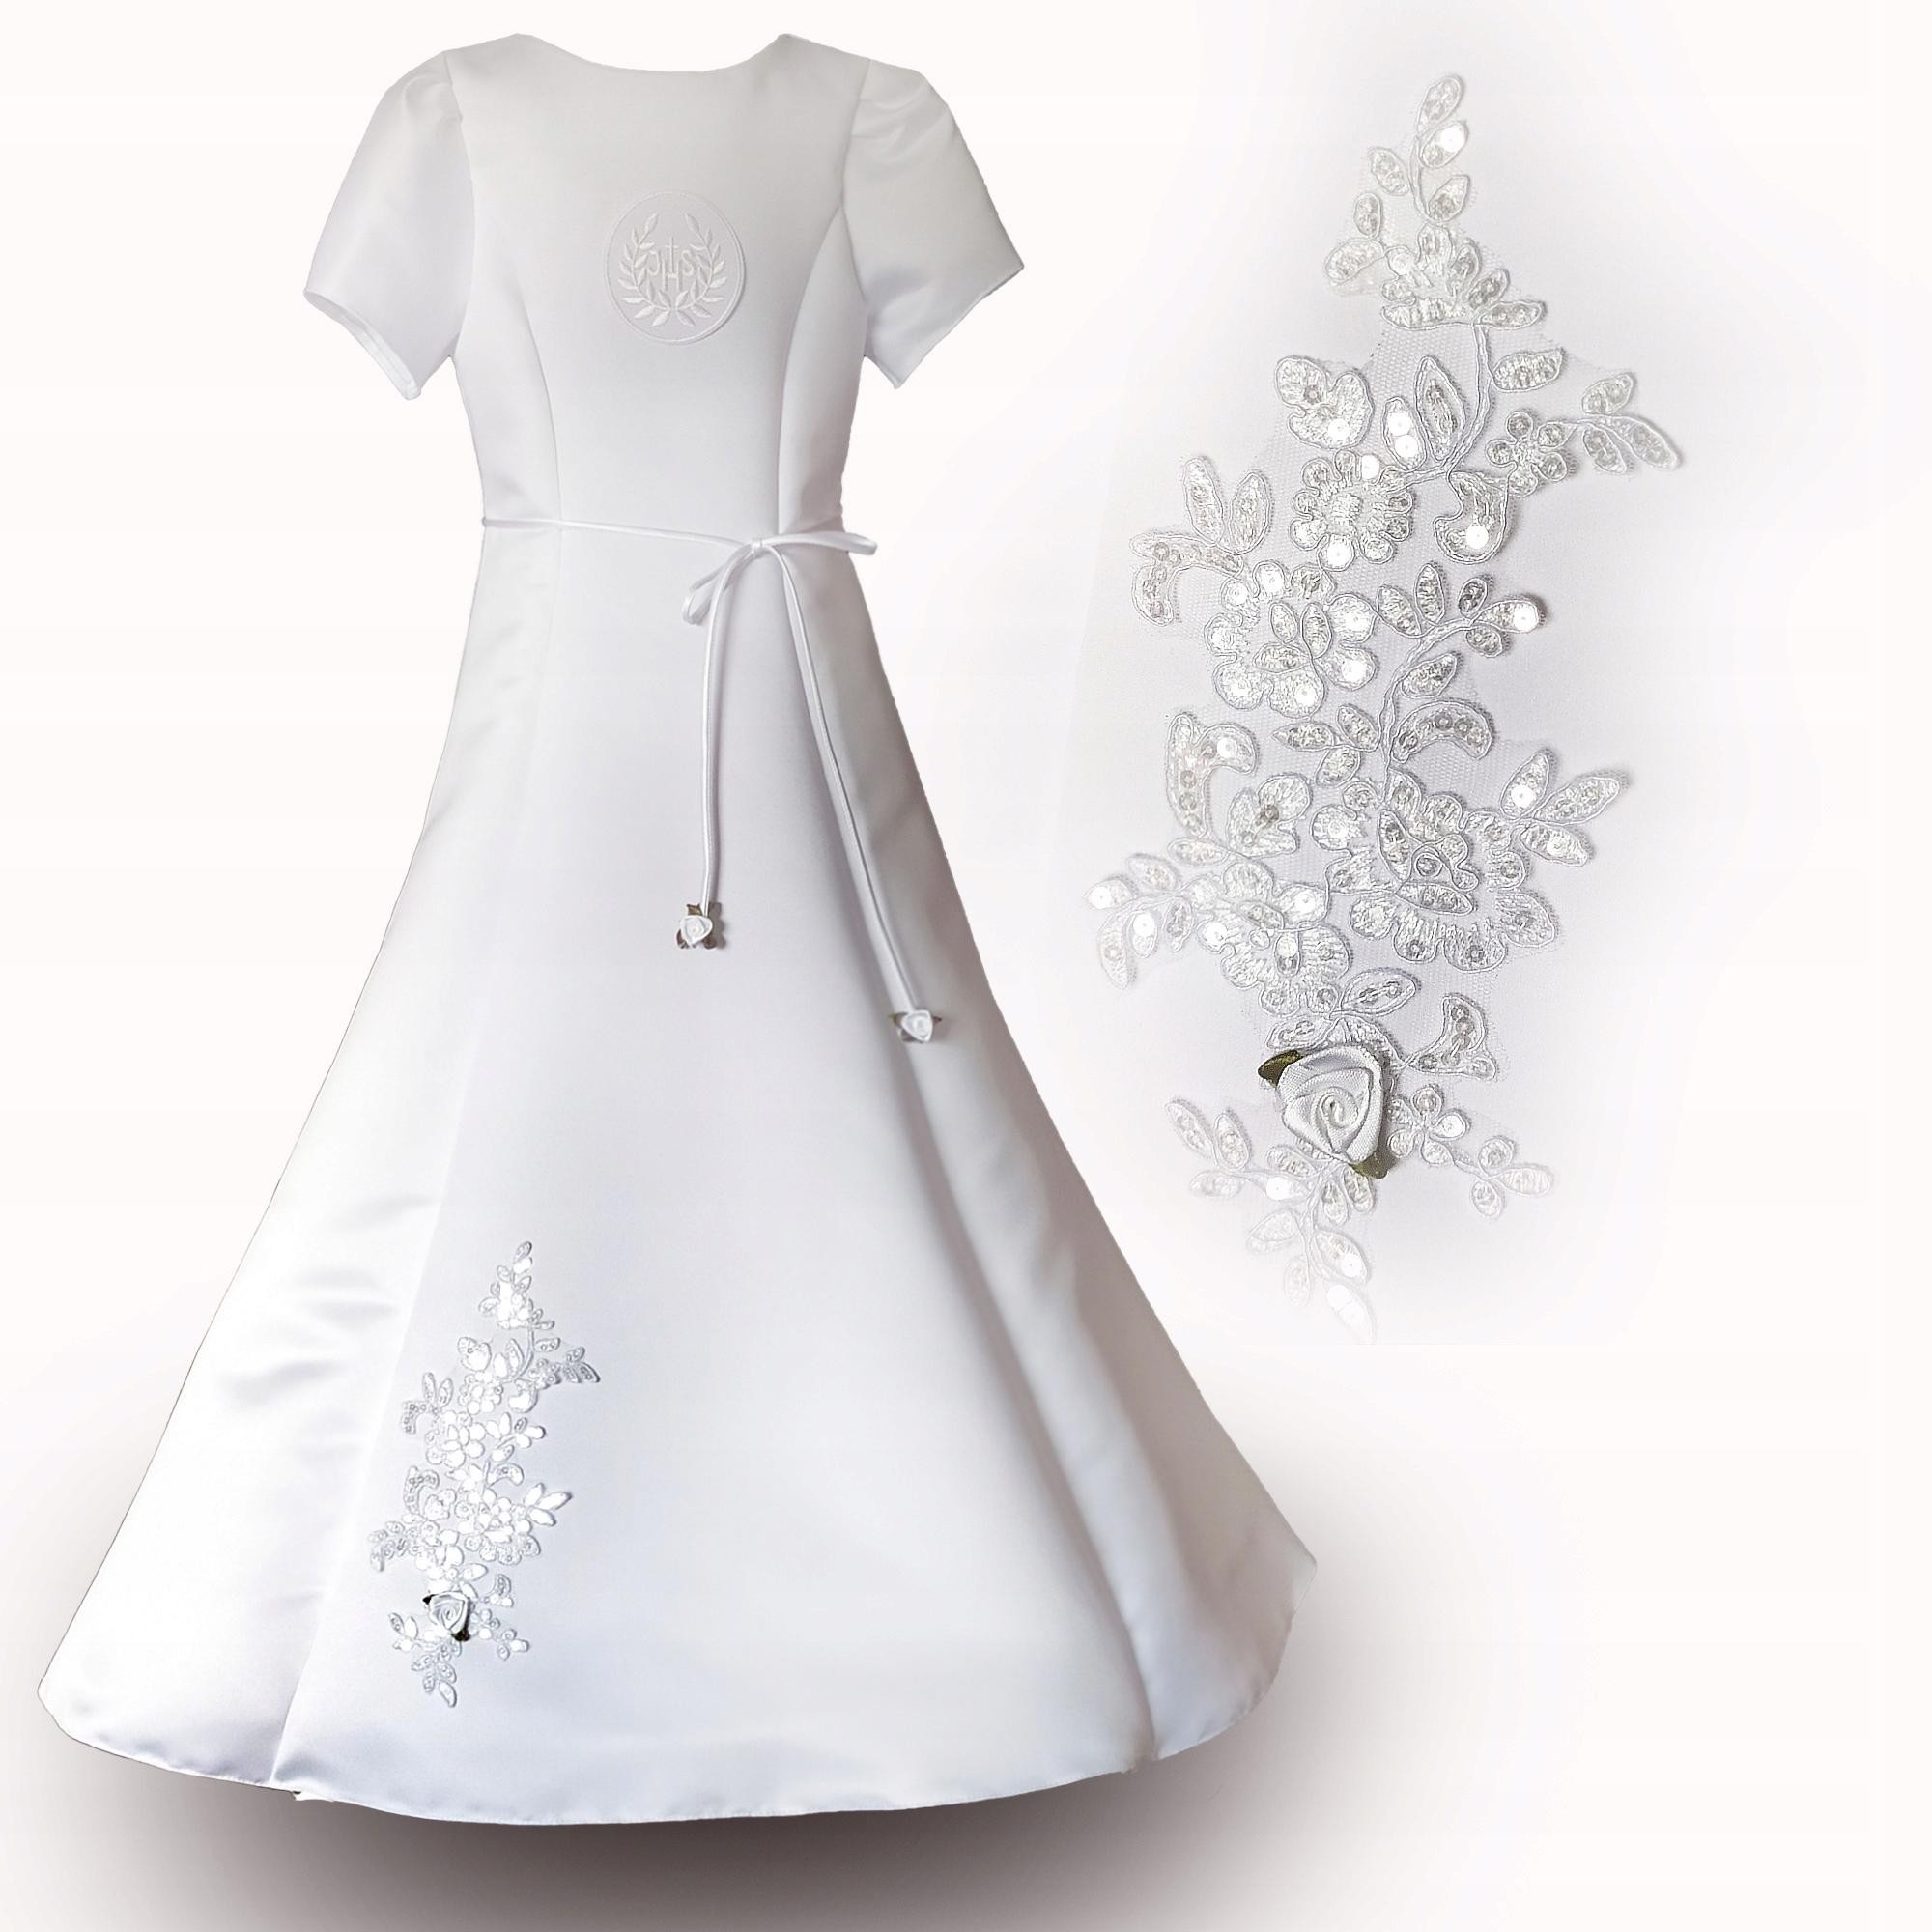 Alba Komunijna Sukienka Komunia Haft Alicja 158 9408978950 Allegro Pl